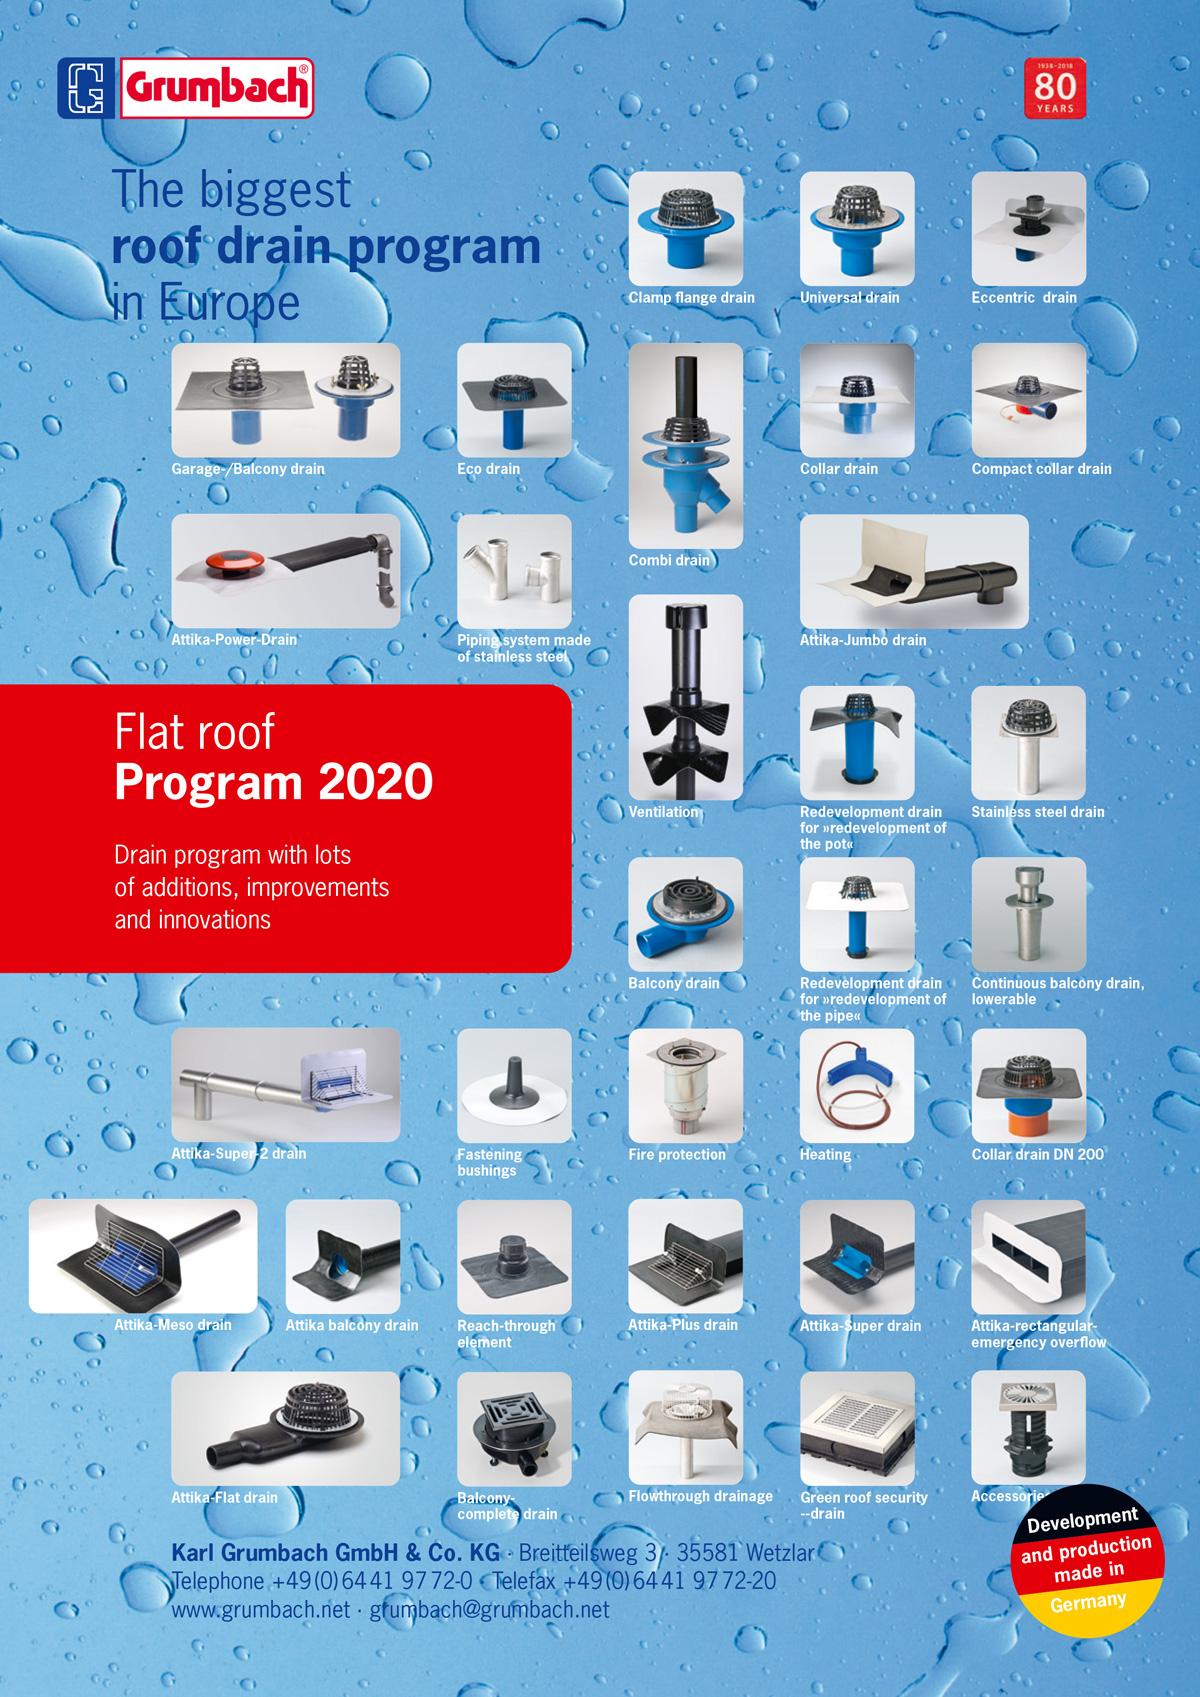 Grumbach Flat roof program 2020